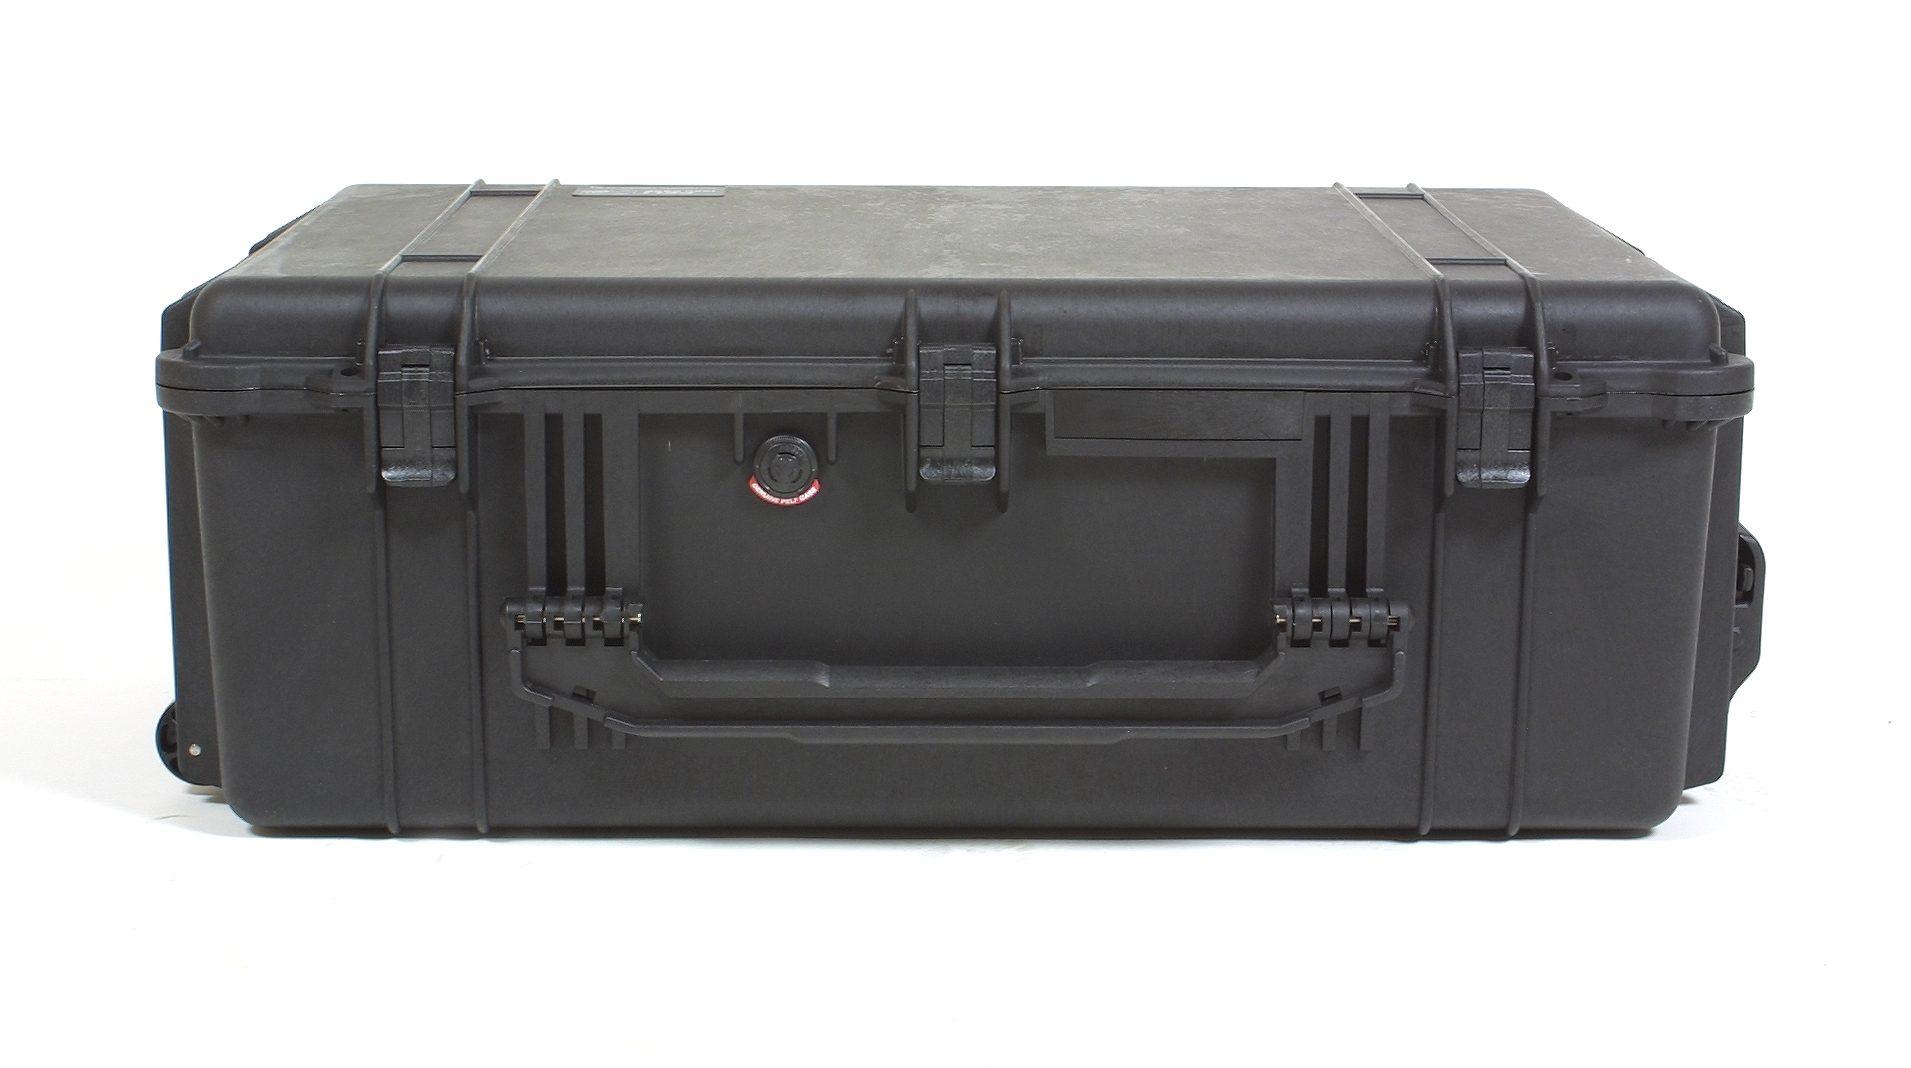 Peli Campingtruhe & -Kiste »box 1650 ohne Schaumeinsatz«